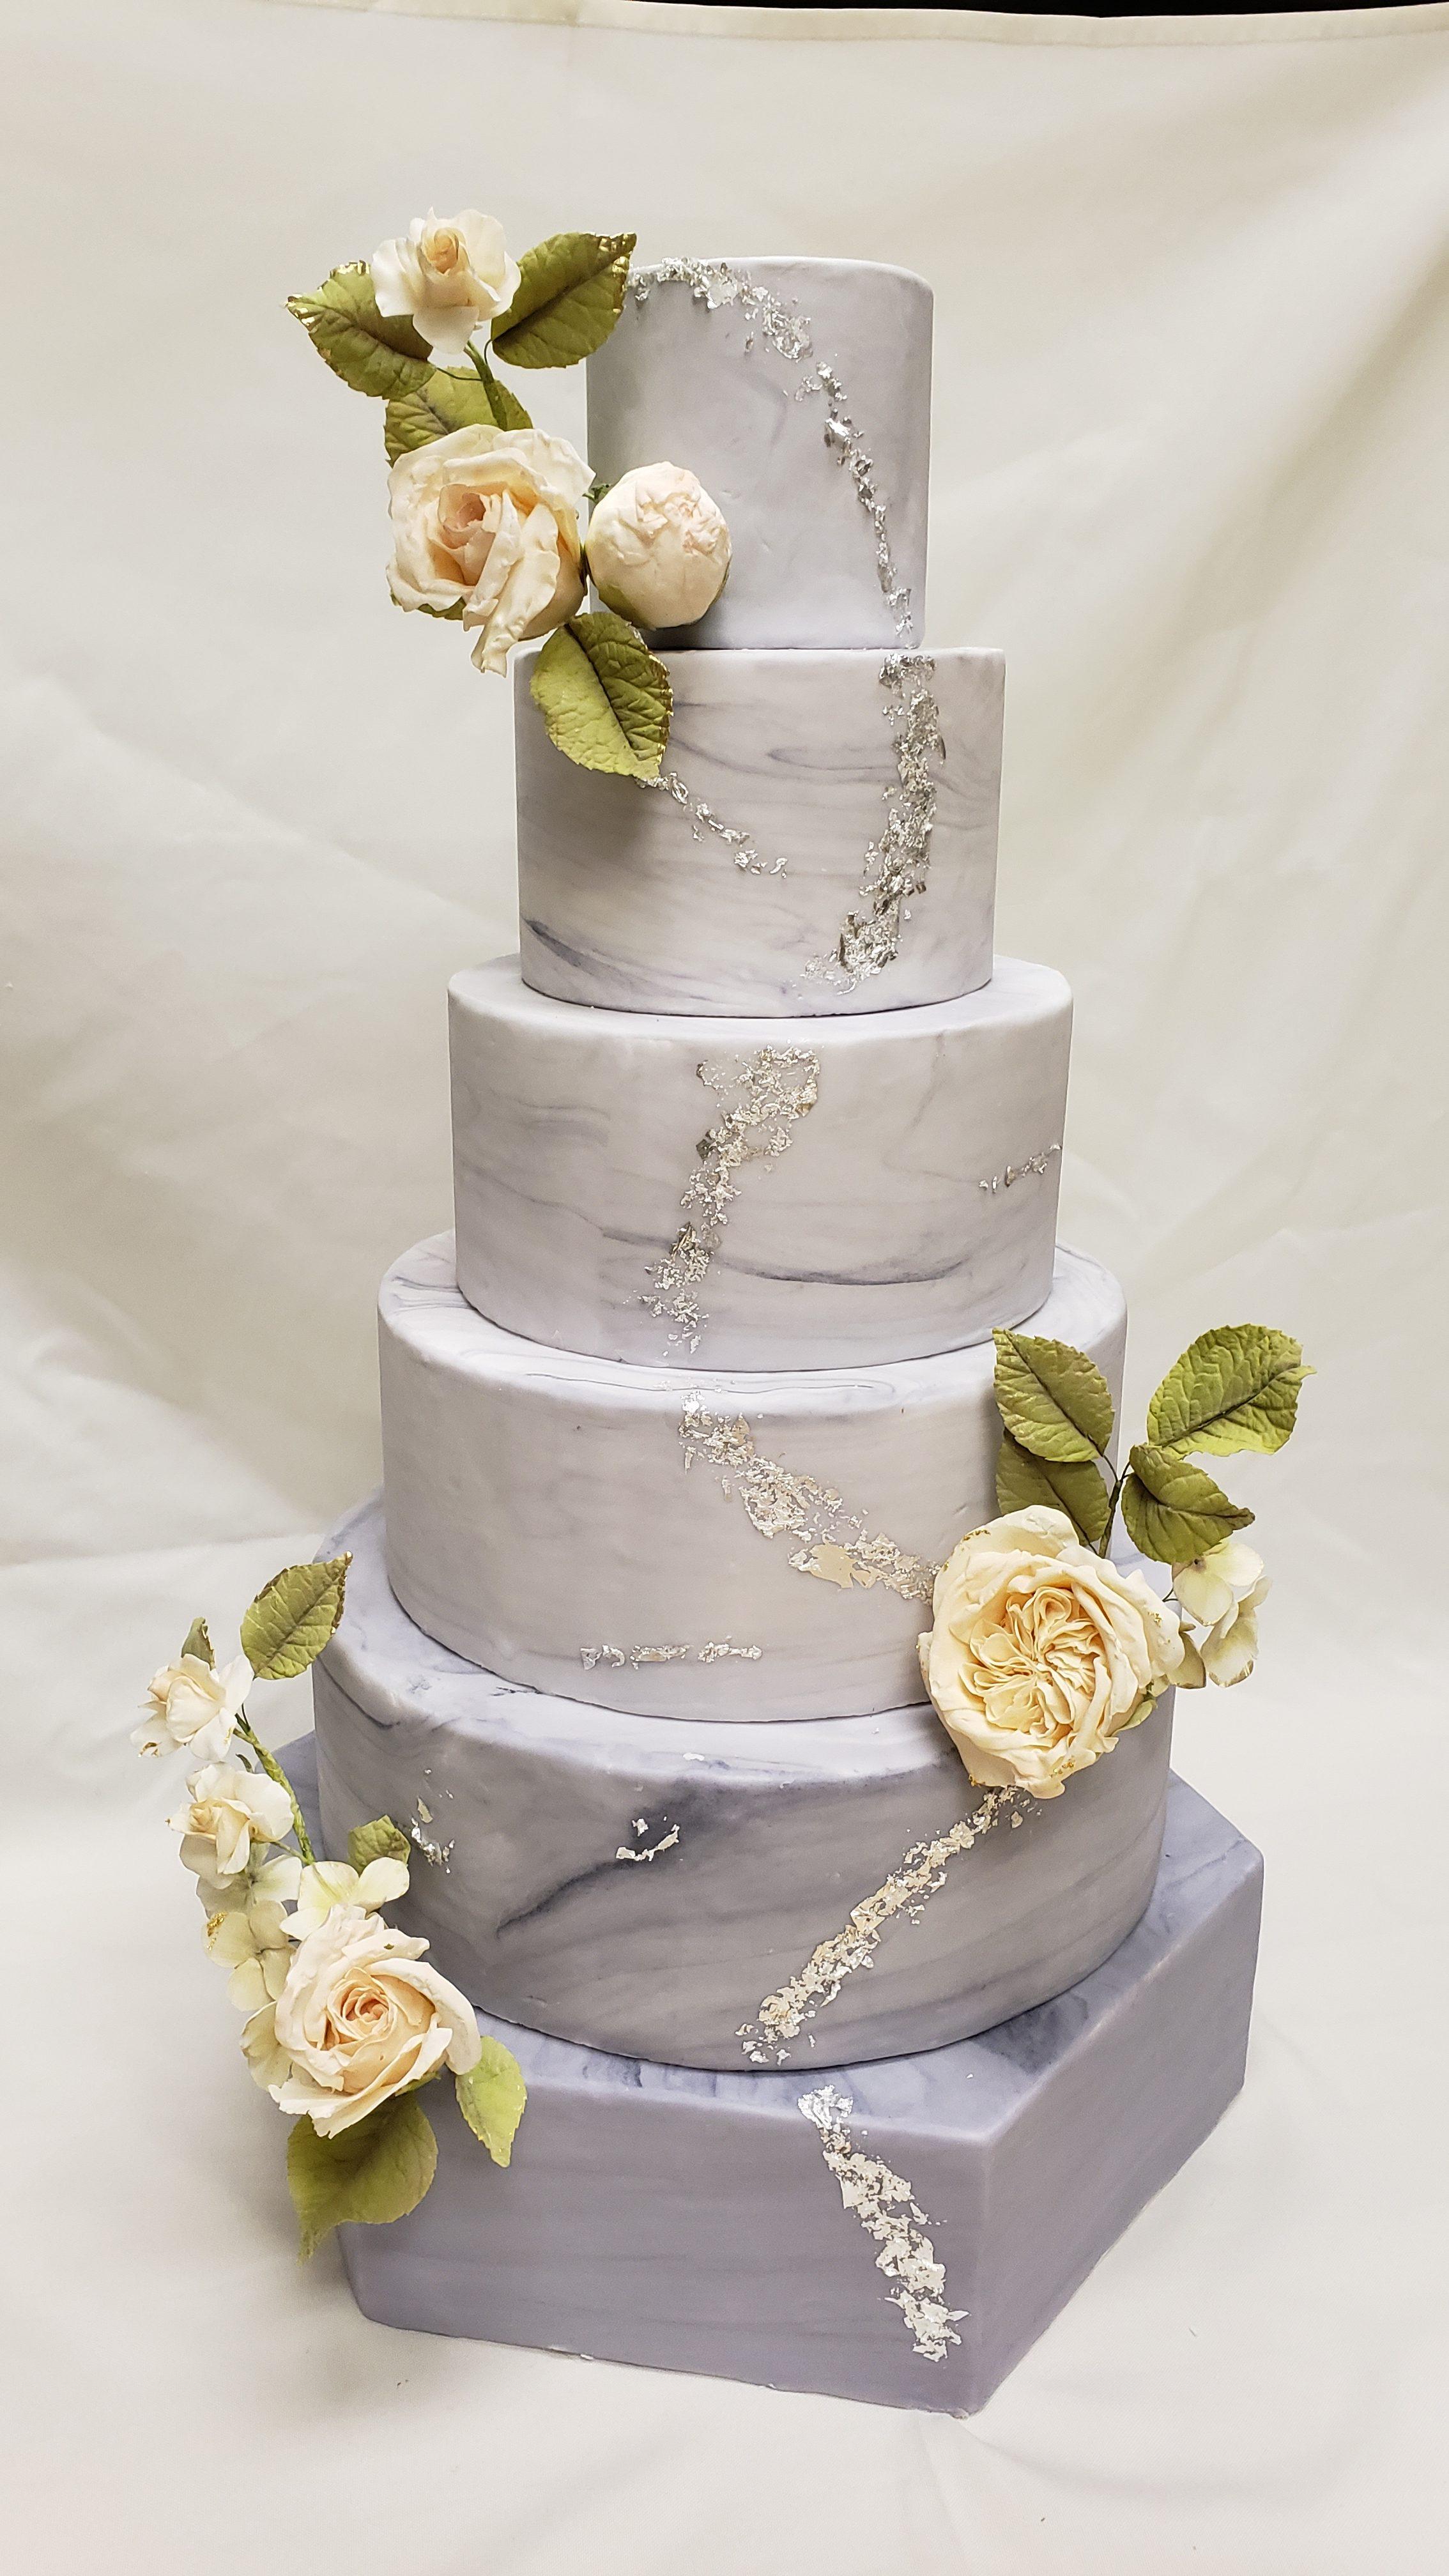 Stunning marble cake